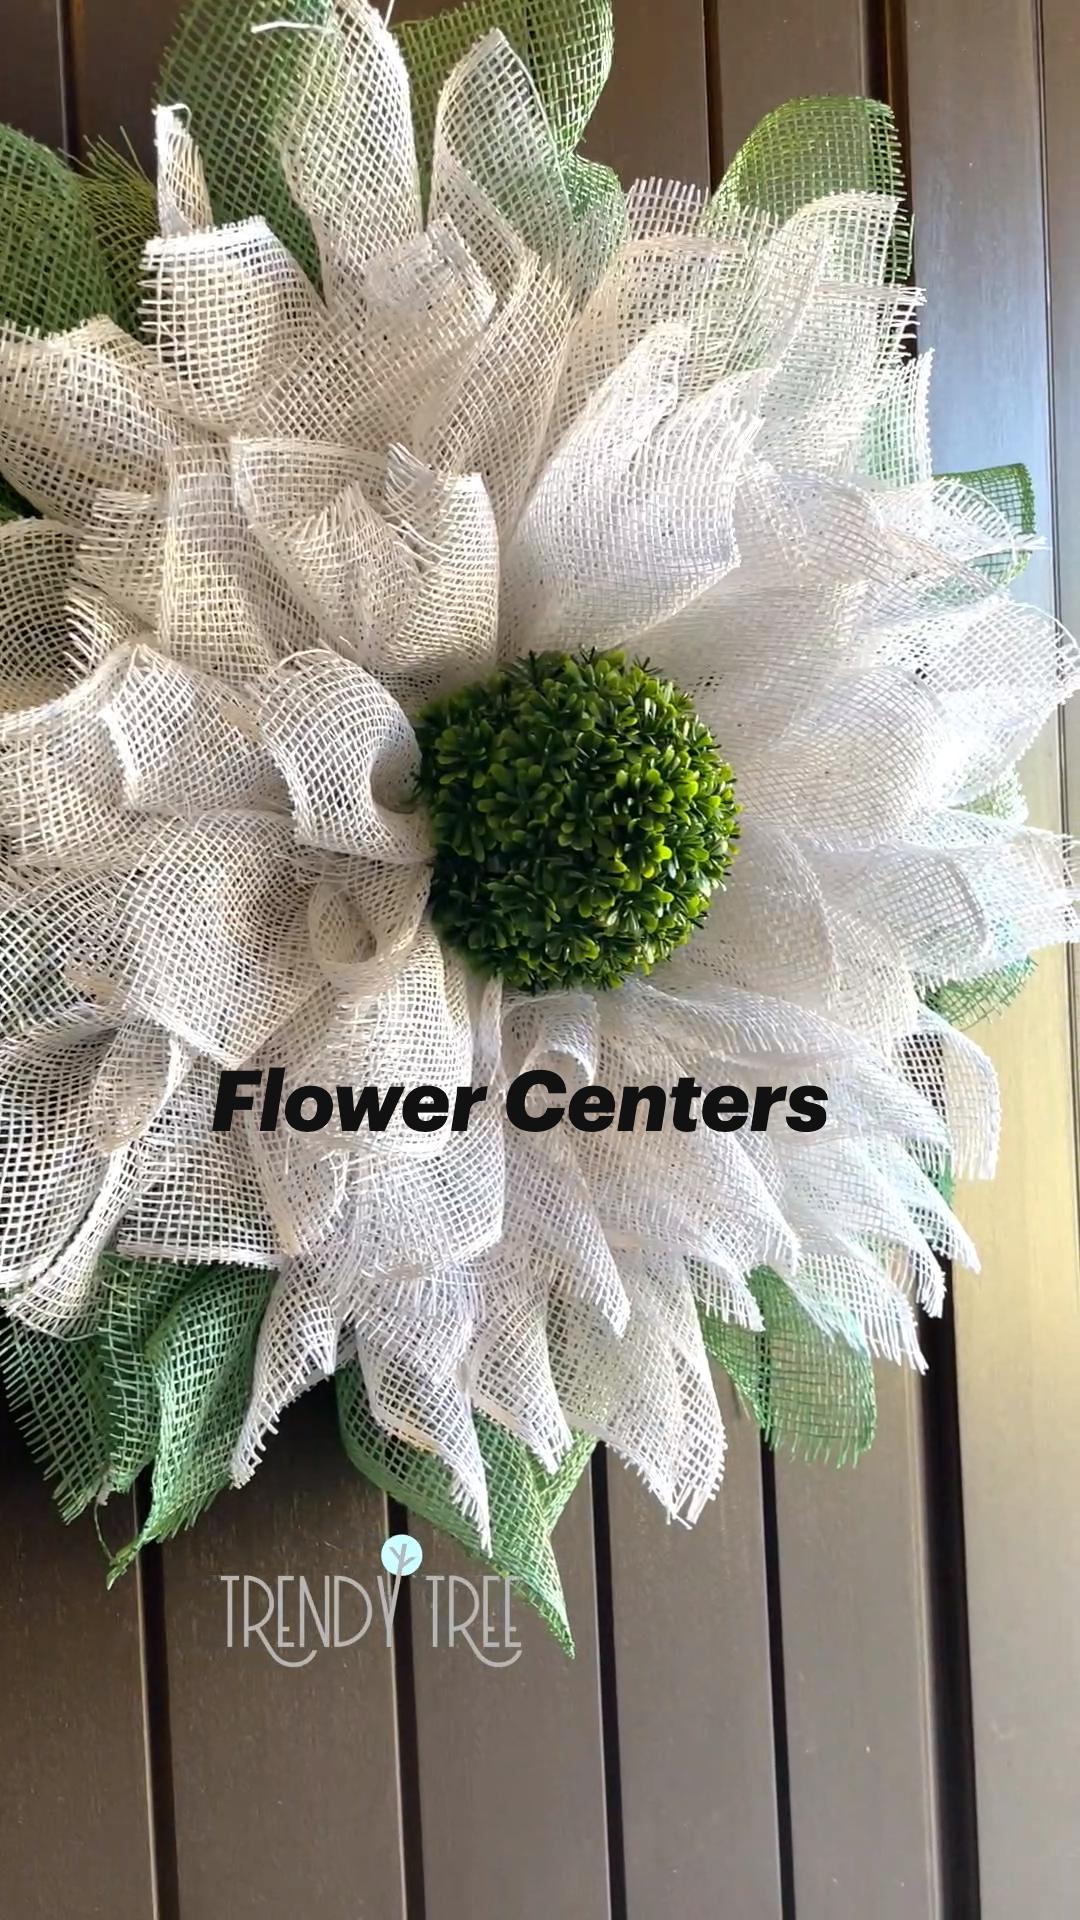 Flower Centers